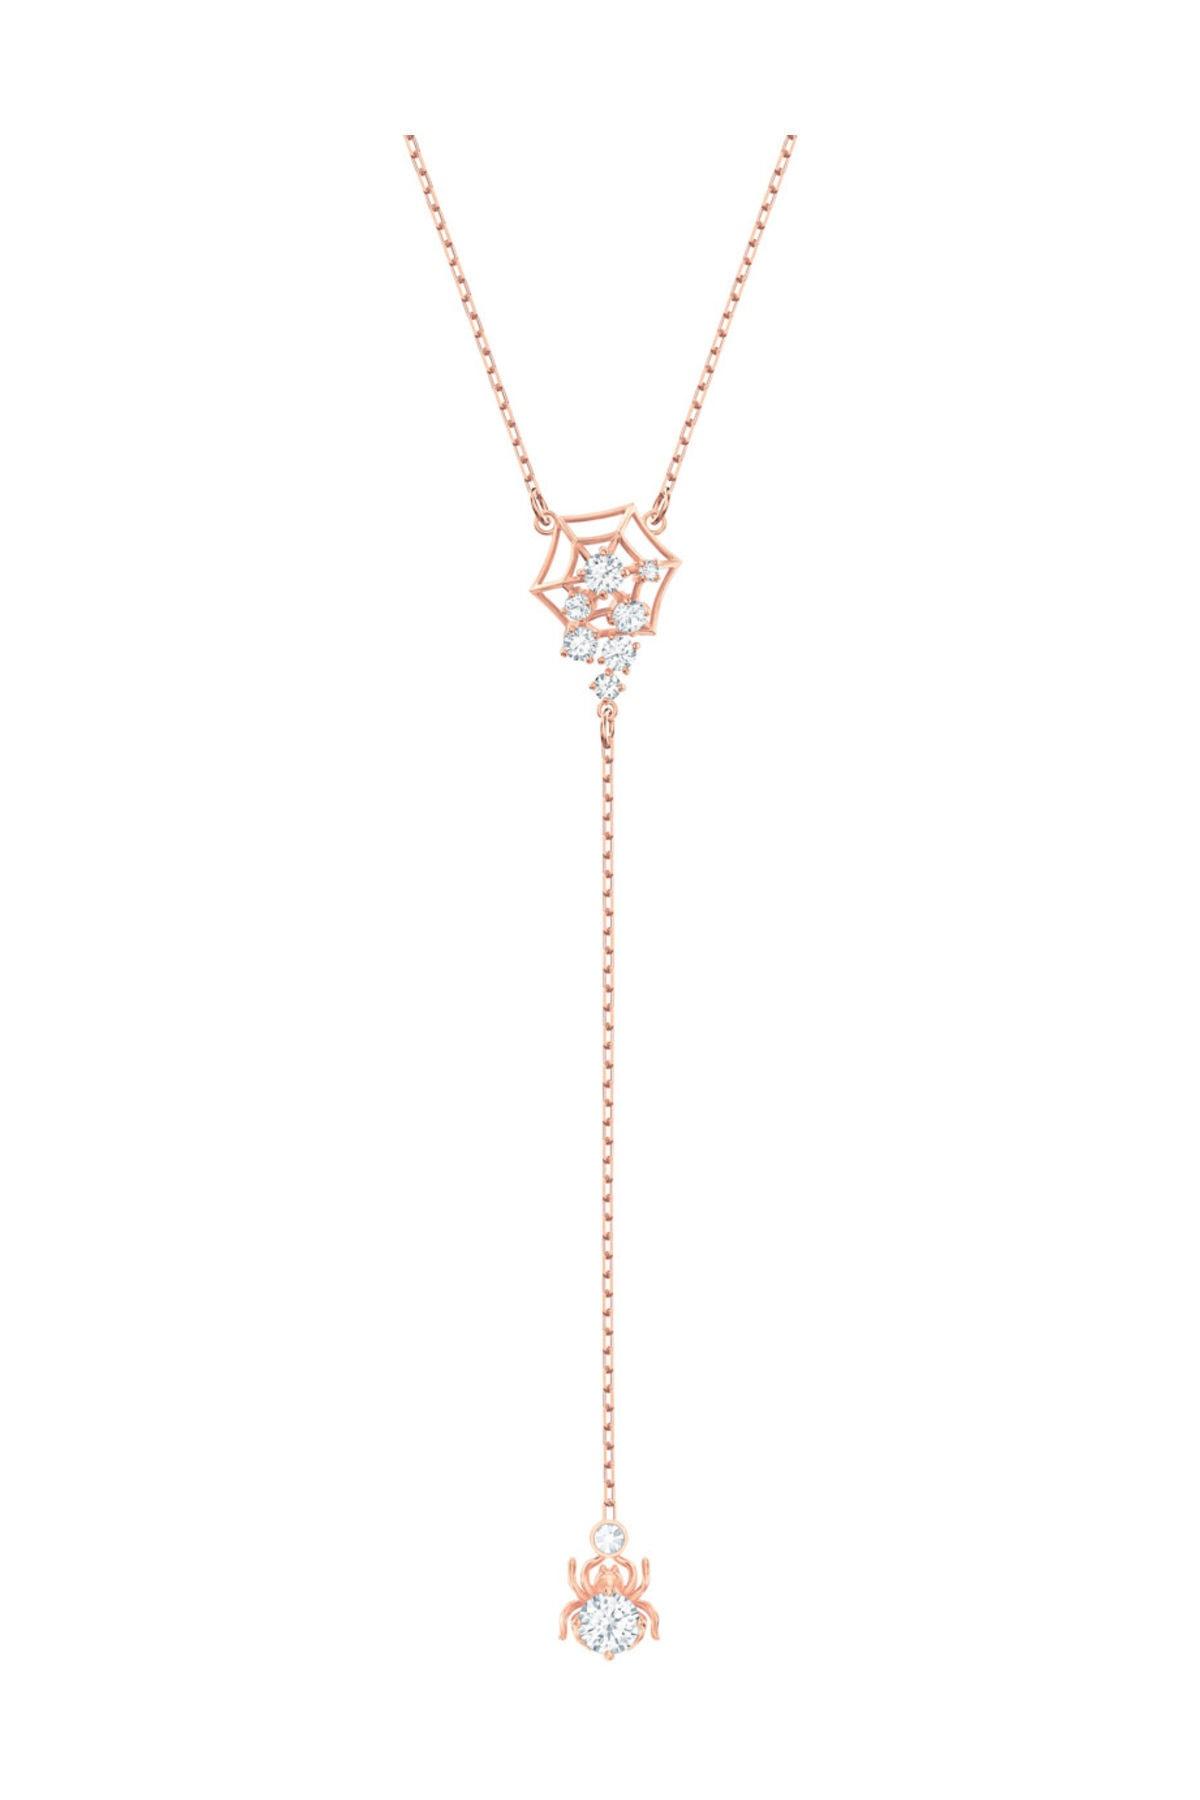 Swarovski Kolye Precisely:Necklace Y Czwh/Cry/Ros 5499885 1